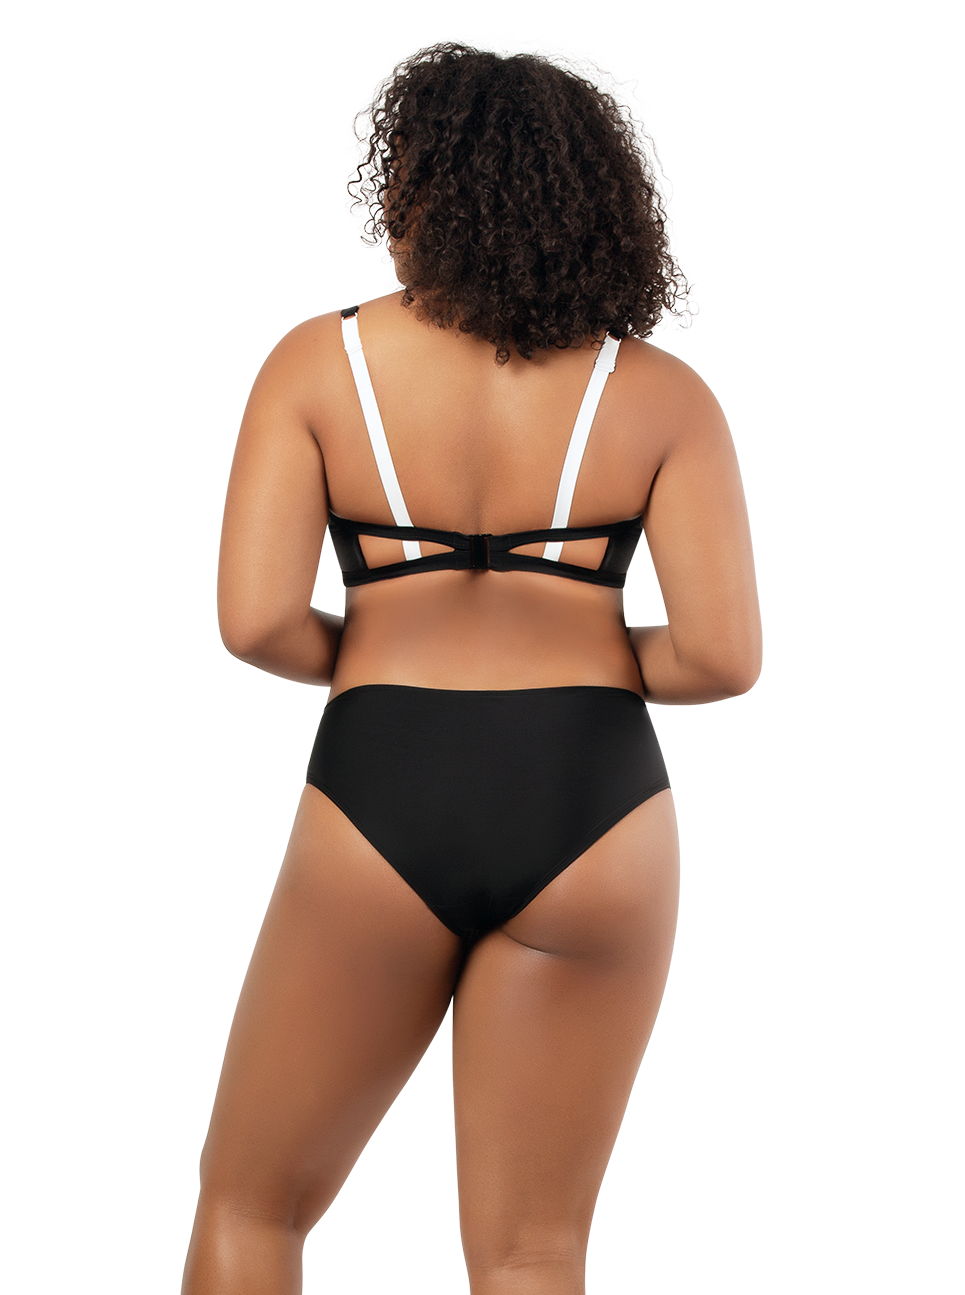 PARFAIT Lauren TriangleSwimTopS8222 HighwaistBikiniBottomS8223 BlackWWhite Back - Lauren Highwaisted Bikini Bottom Black w White S8223